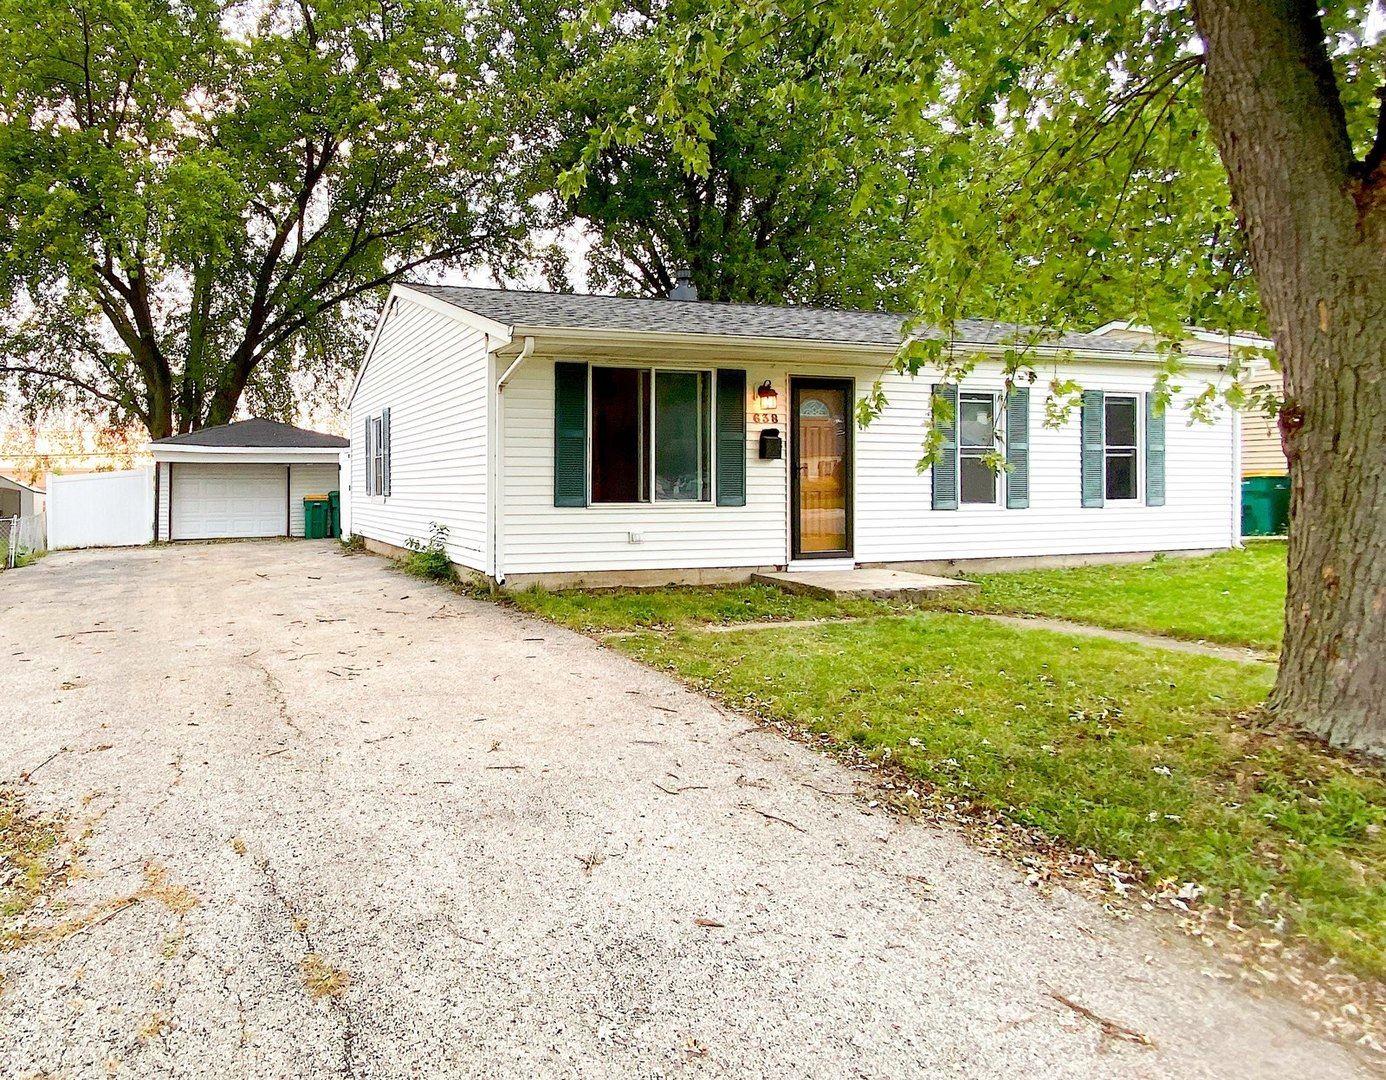 Photo of 638 MONTROSE Drive, Romeoville, IL 60446 (MLS # 10881742)